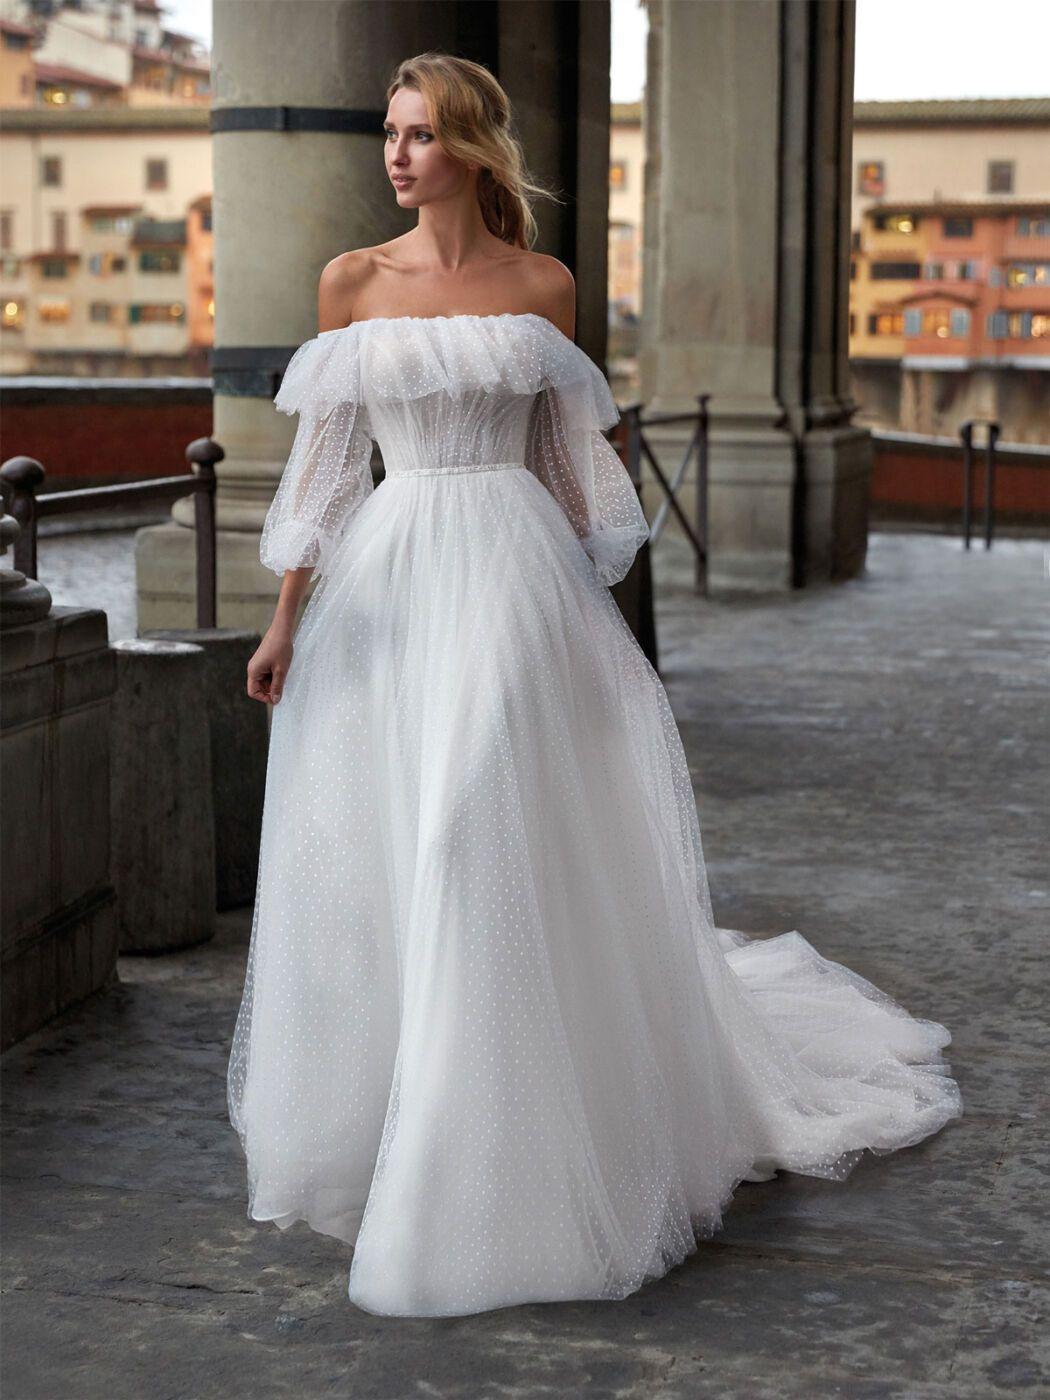 https://www.weddingmagazine.com.ua/wp-content/uploads/2020/06/nicole-milano-2021.jpg